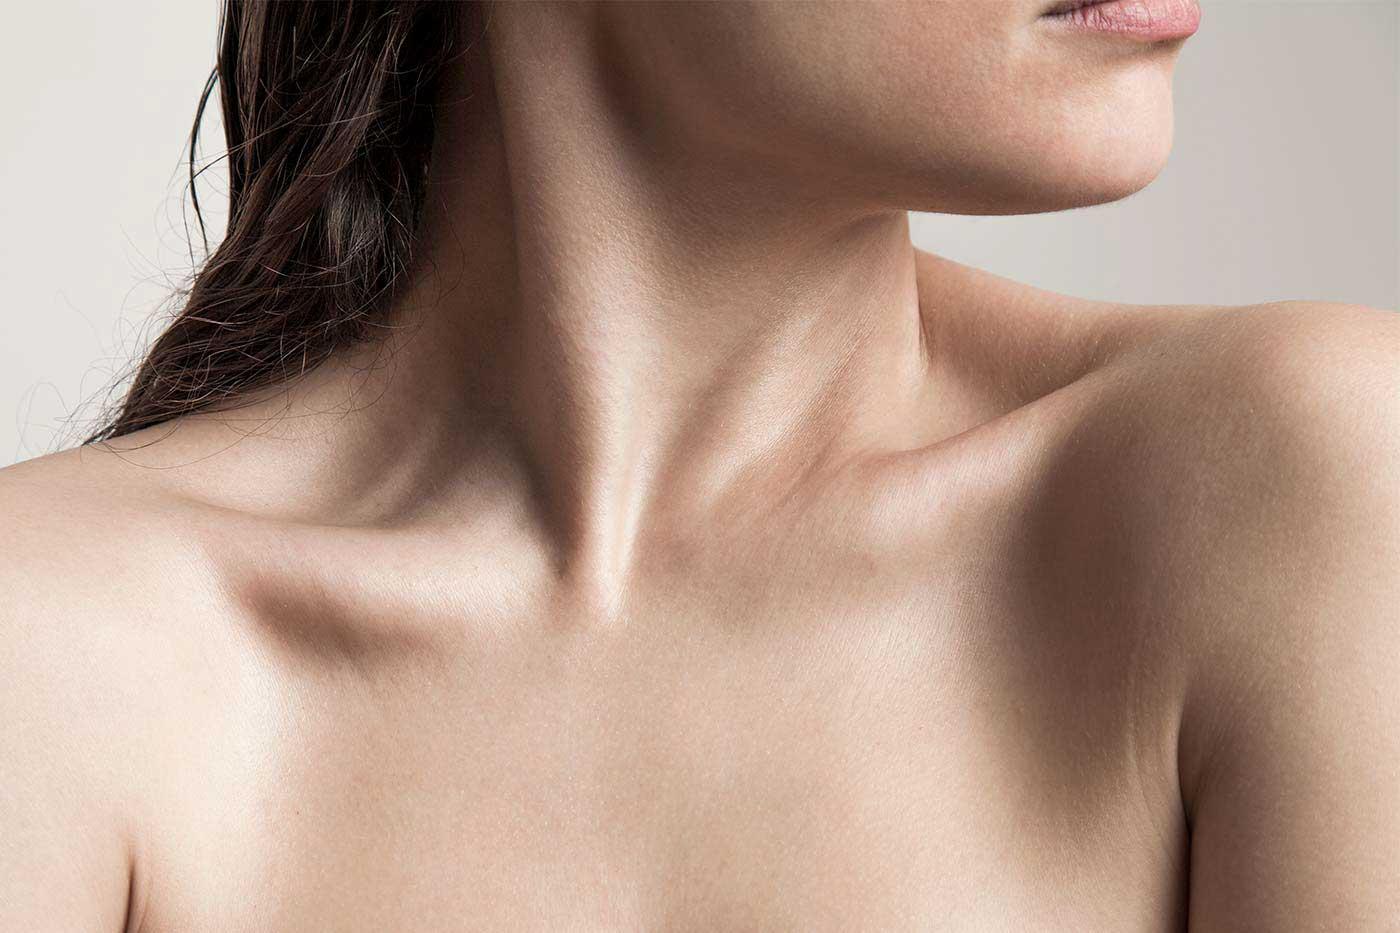 liposukcja podbródka Kaniowscy Clinic o zabiegu